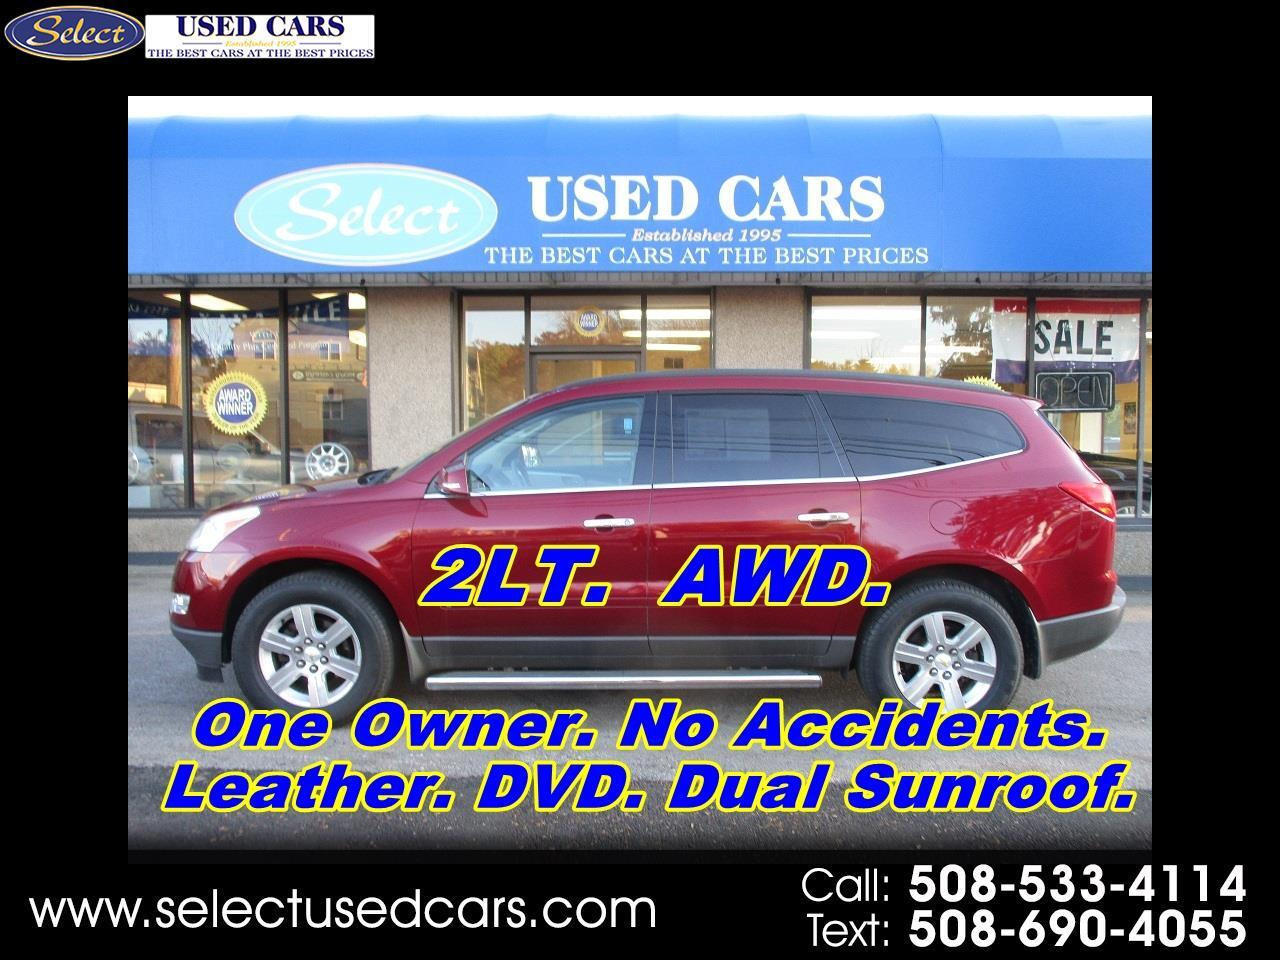 2010 Chevrolet Traverse 2LT AWD